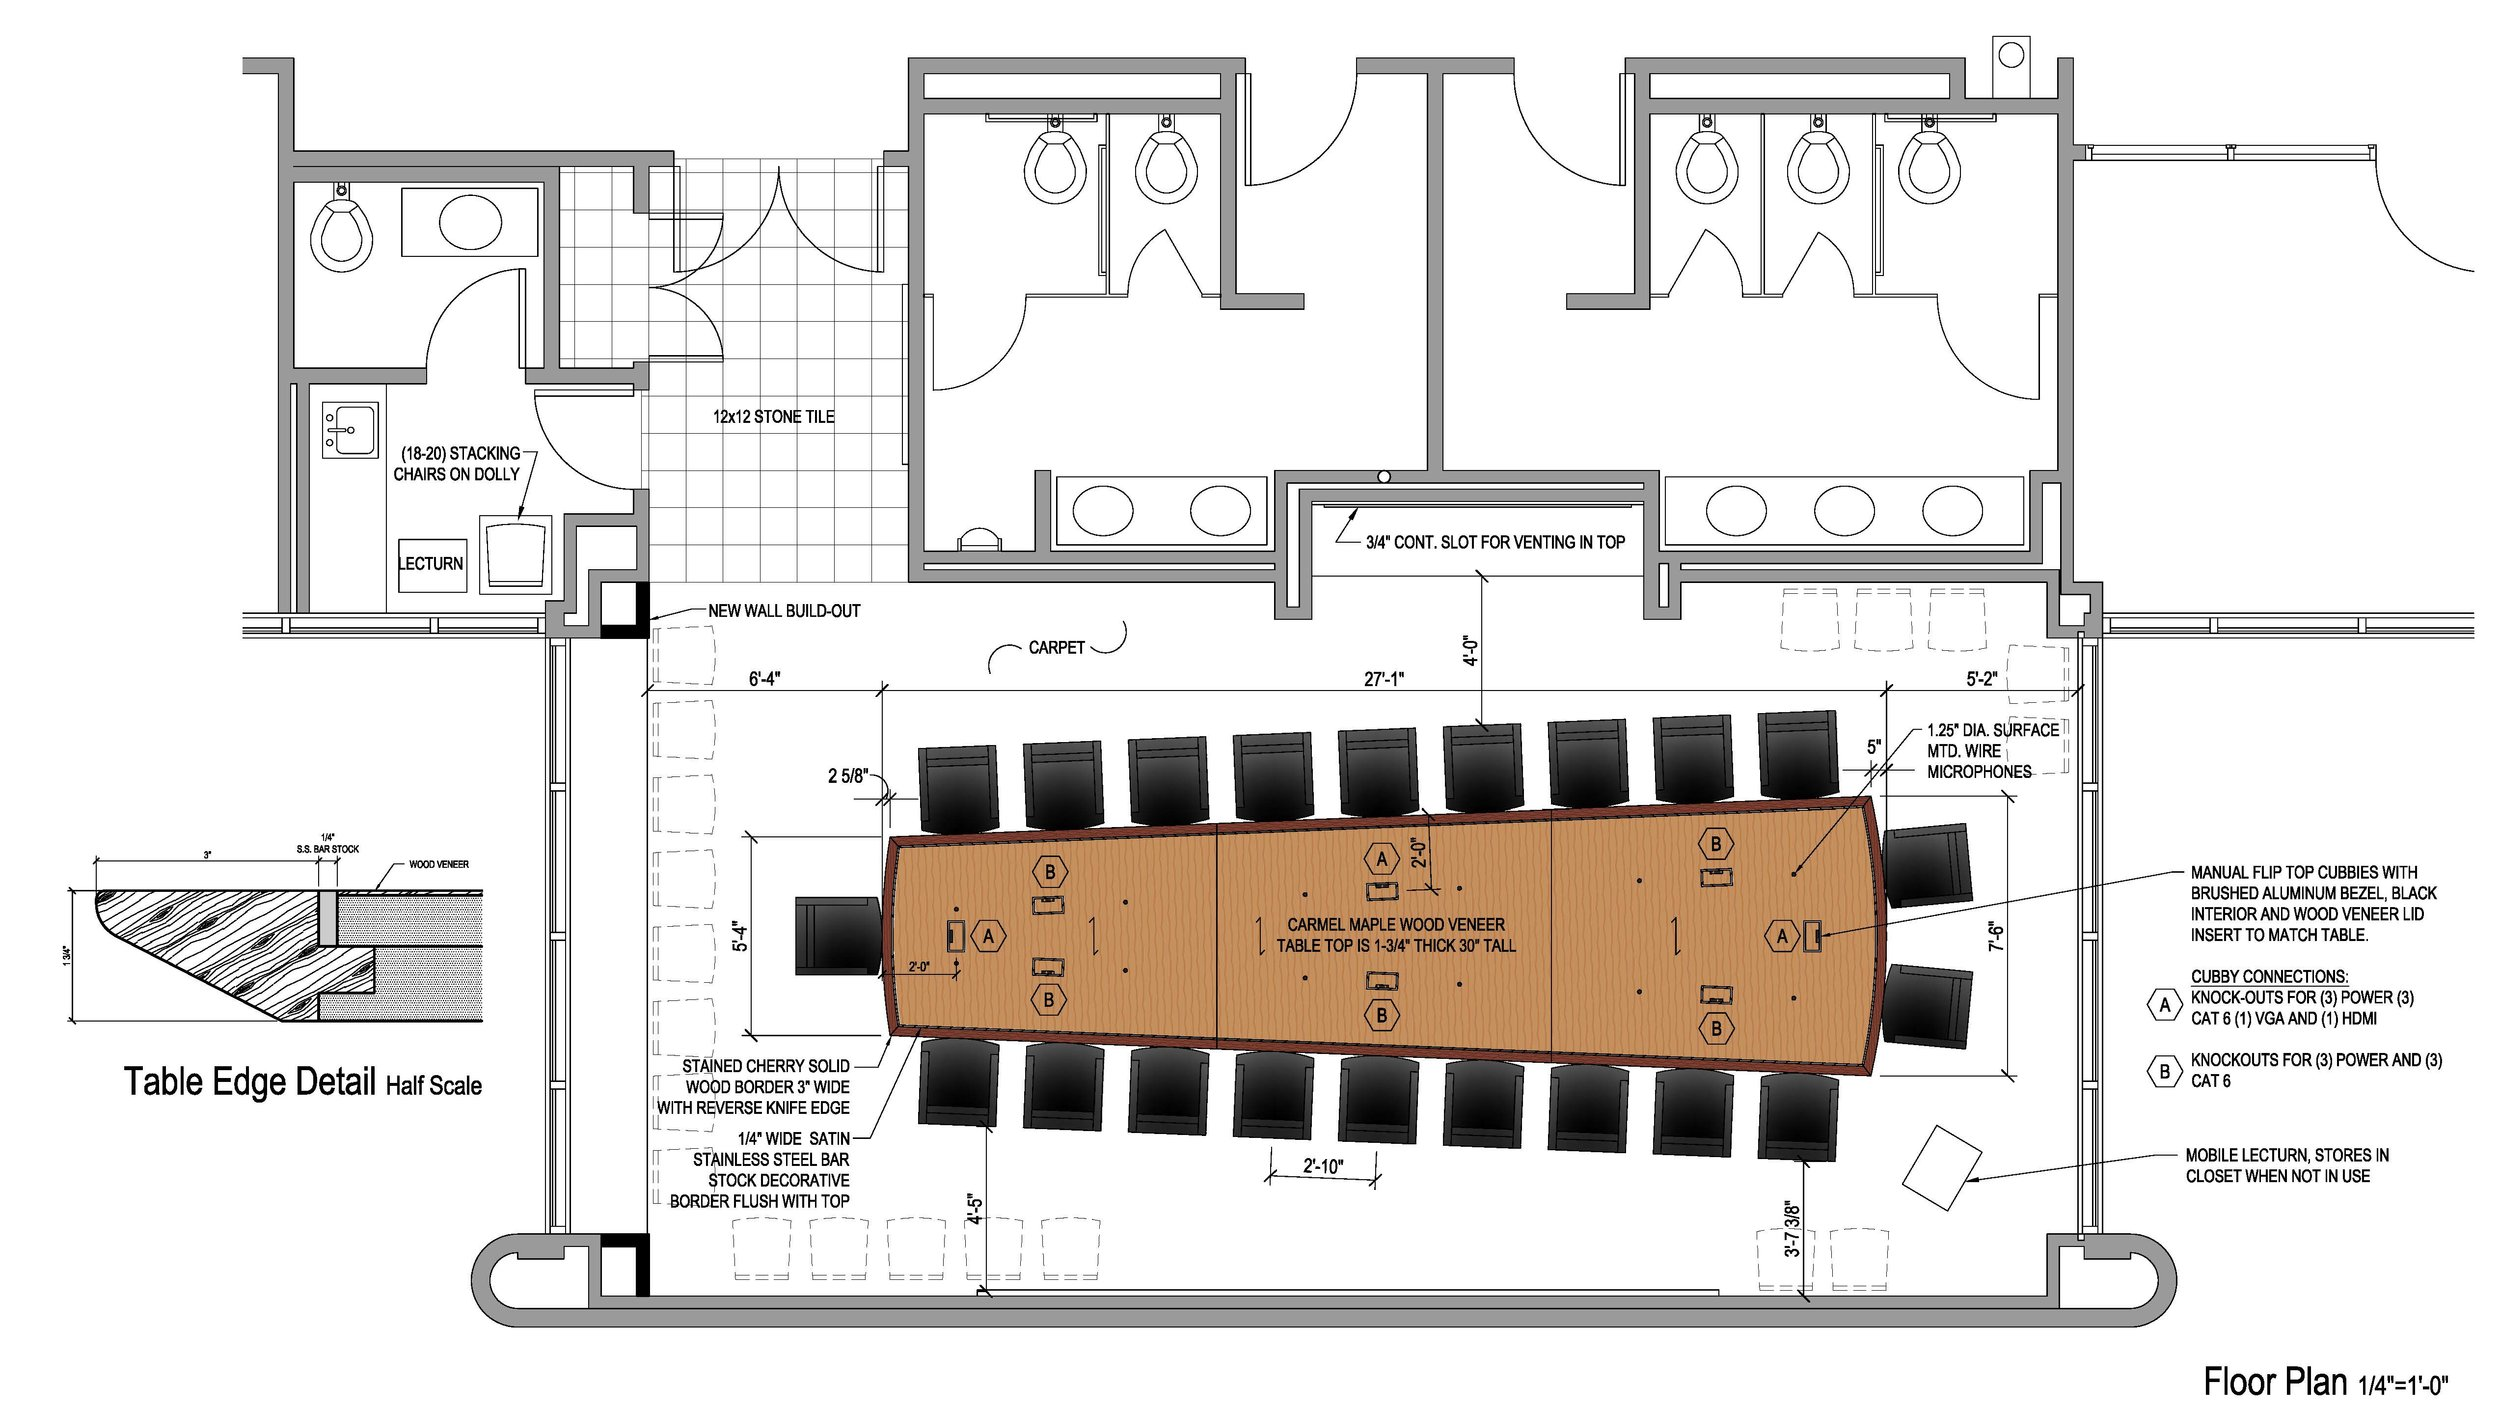 Provisur Technologies 01 - Floor Plan.jpg